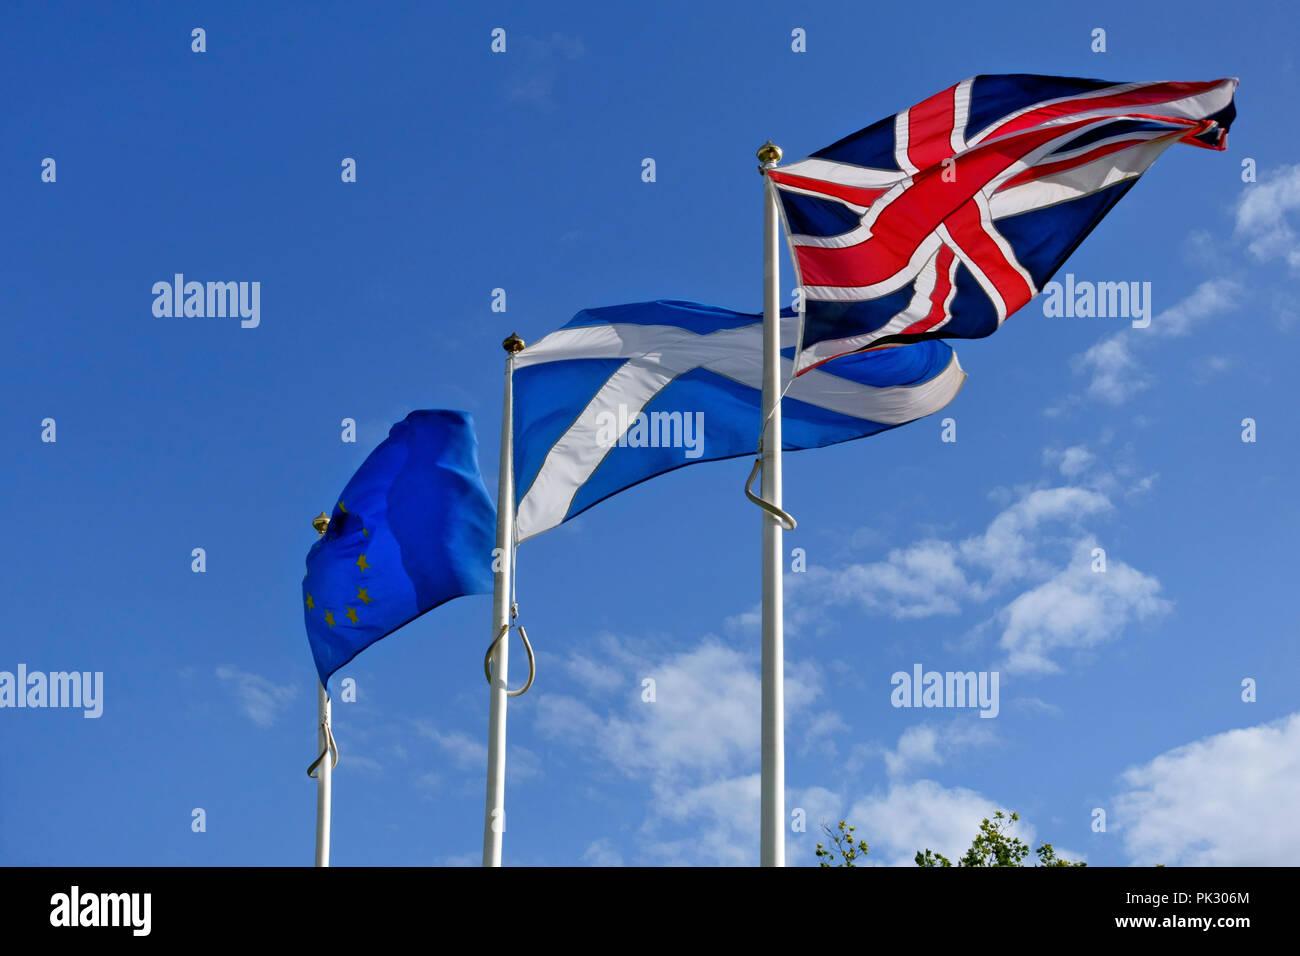 Union Jack, Scottish Saltire and the European Union flags - Stock Image